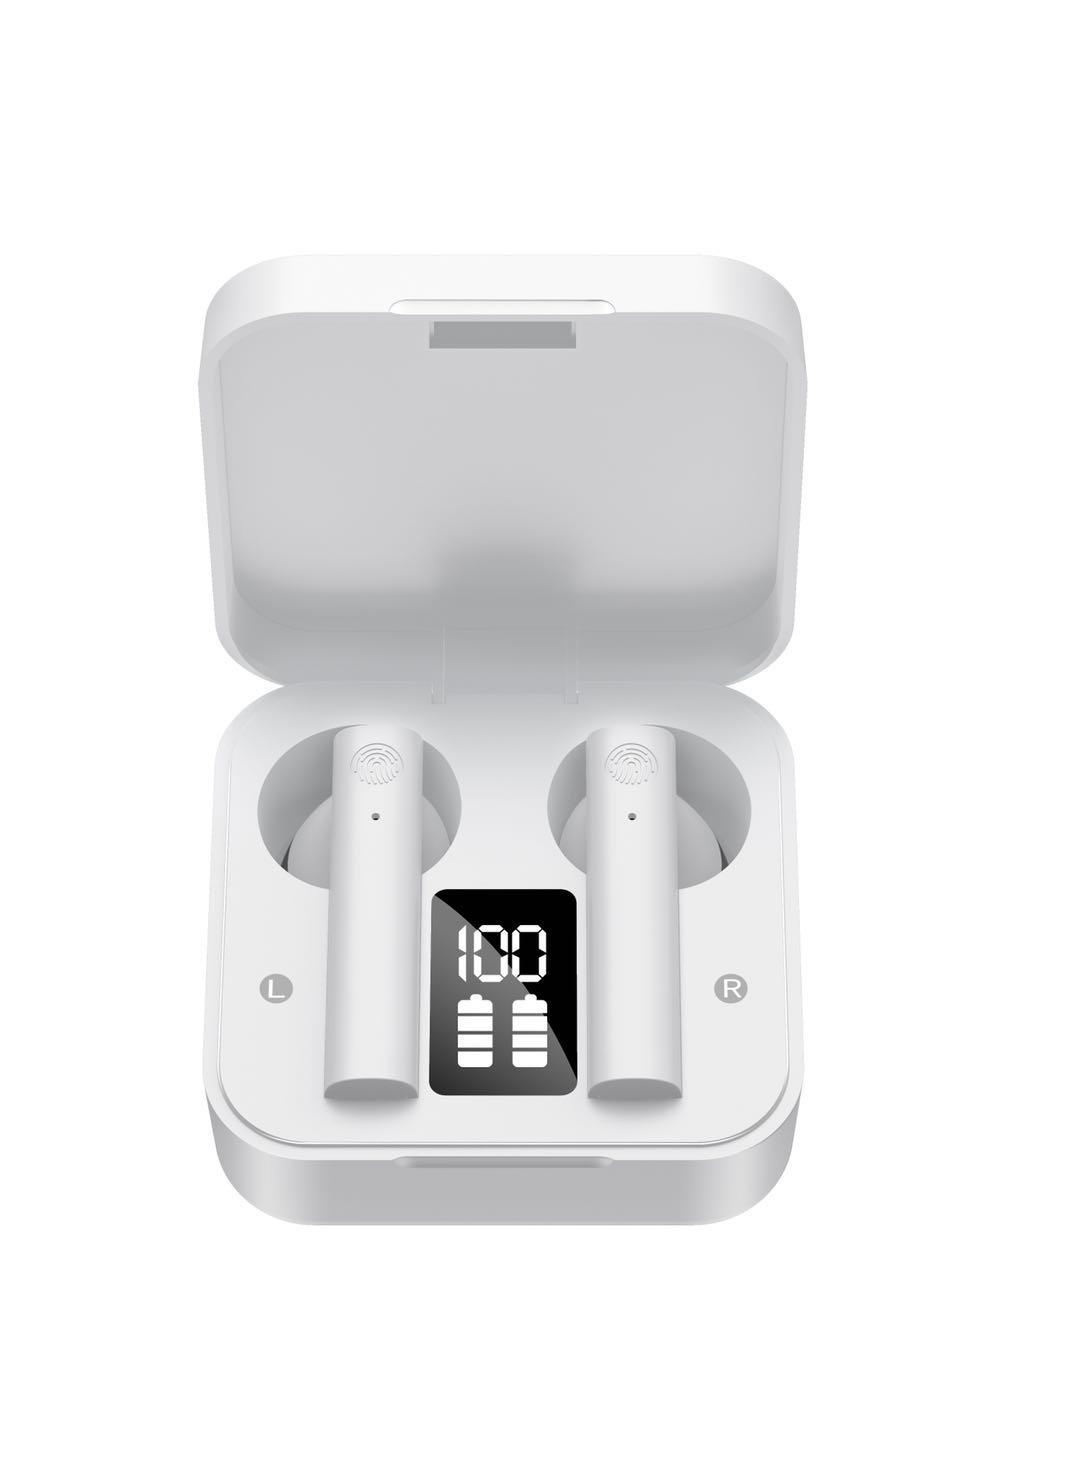 Air2S Bluetooth Headset Mini Wireless 5.1 Fingerprint Touch Earphones white